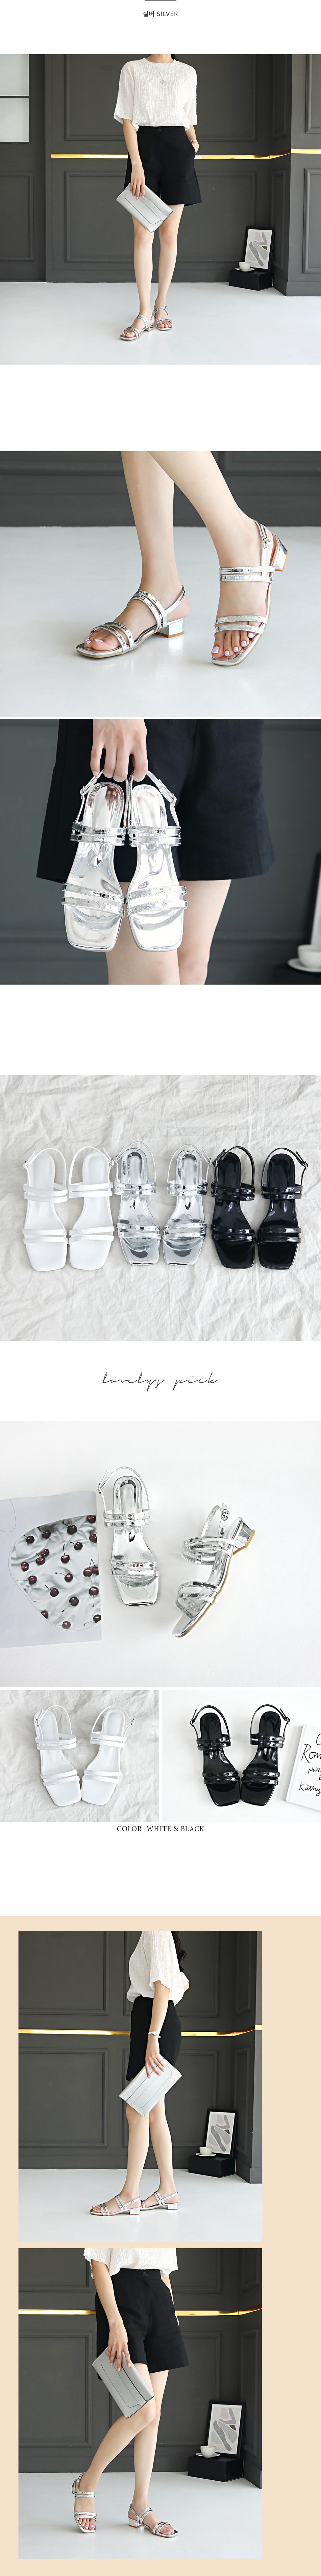 Tinero slingback sandals 3 cm